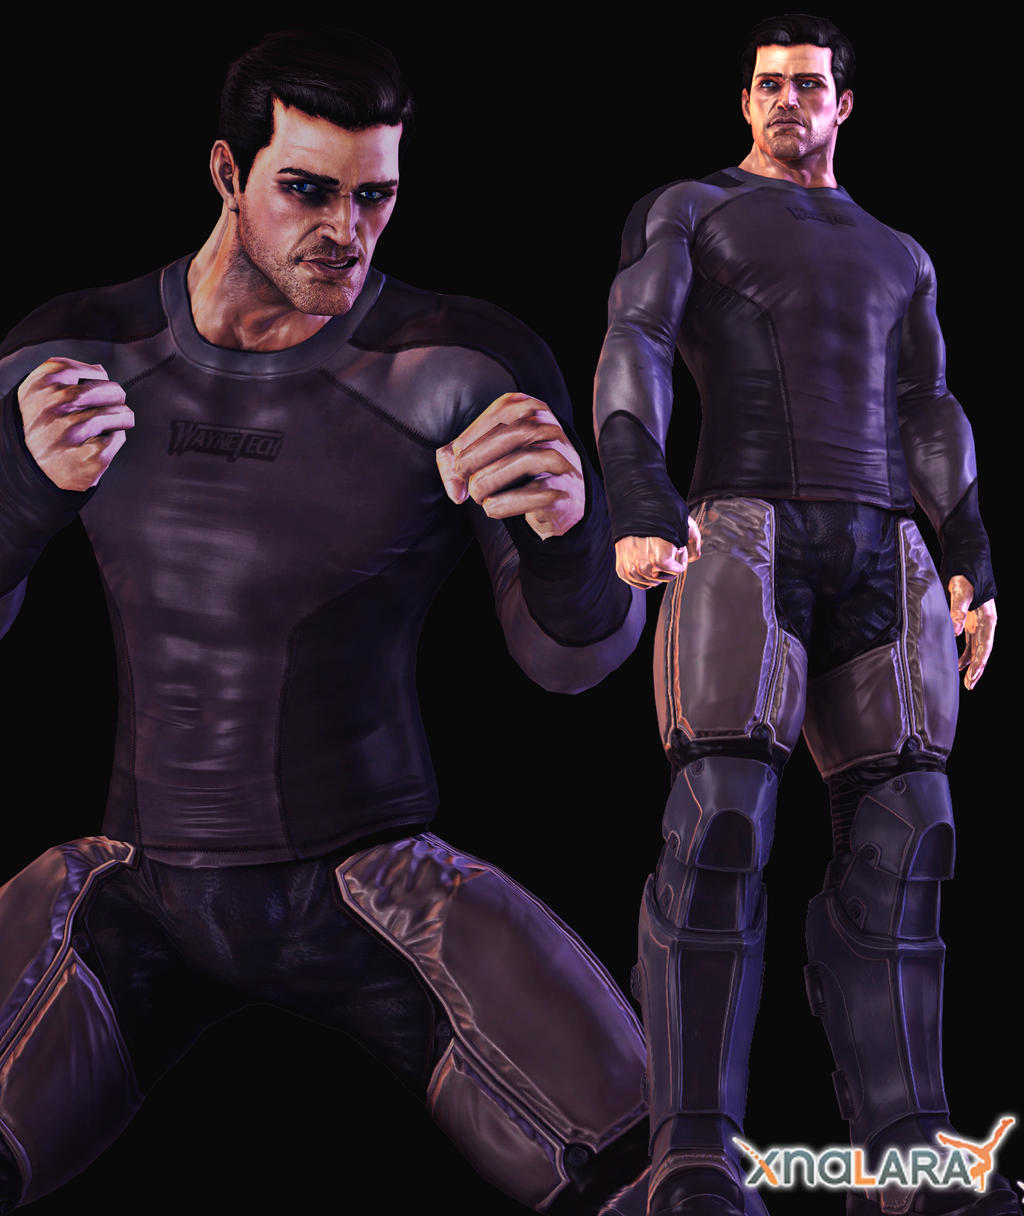 Bao bruce wayne waynetech bodysuit by sticklove on deviantart